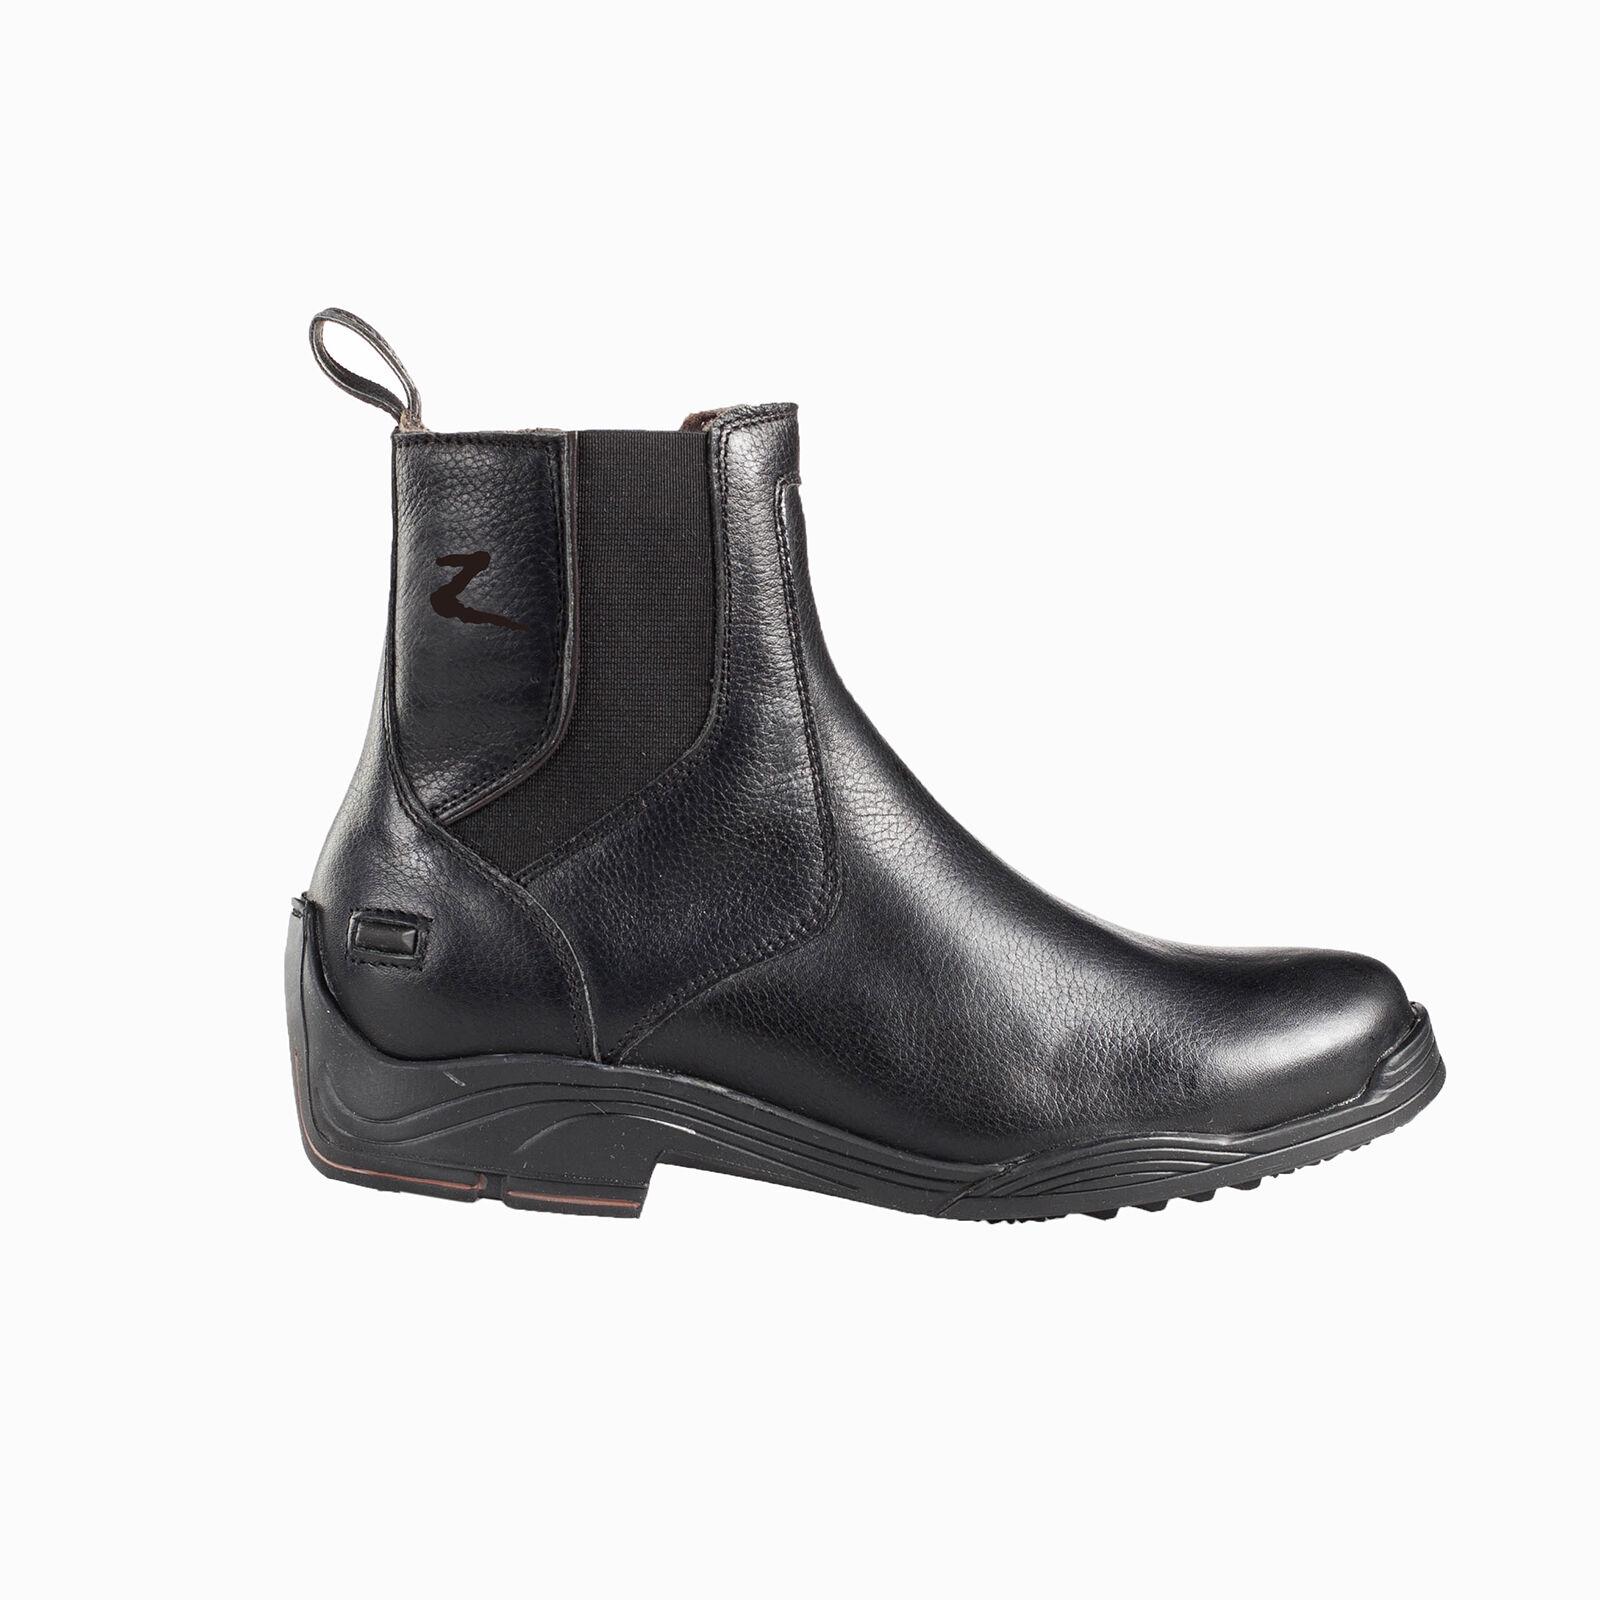 Horze Camden Winter Paddock Boots